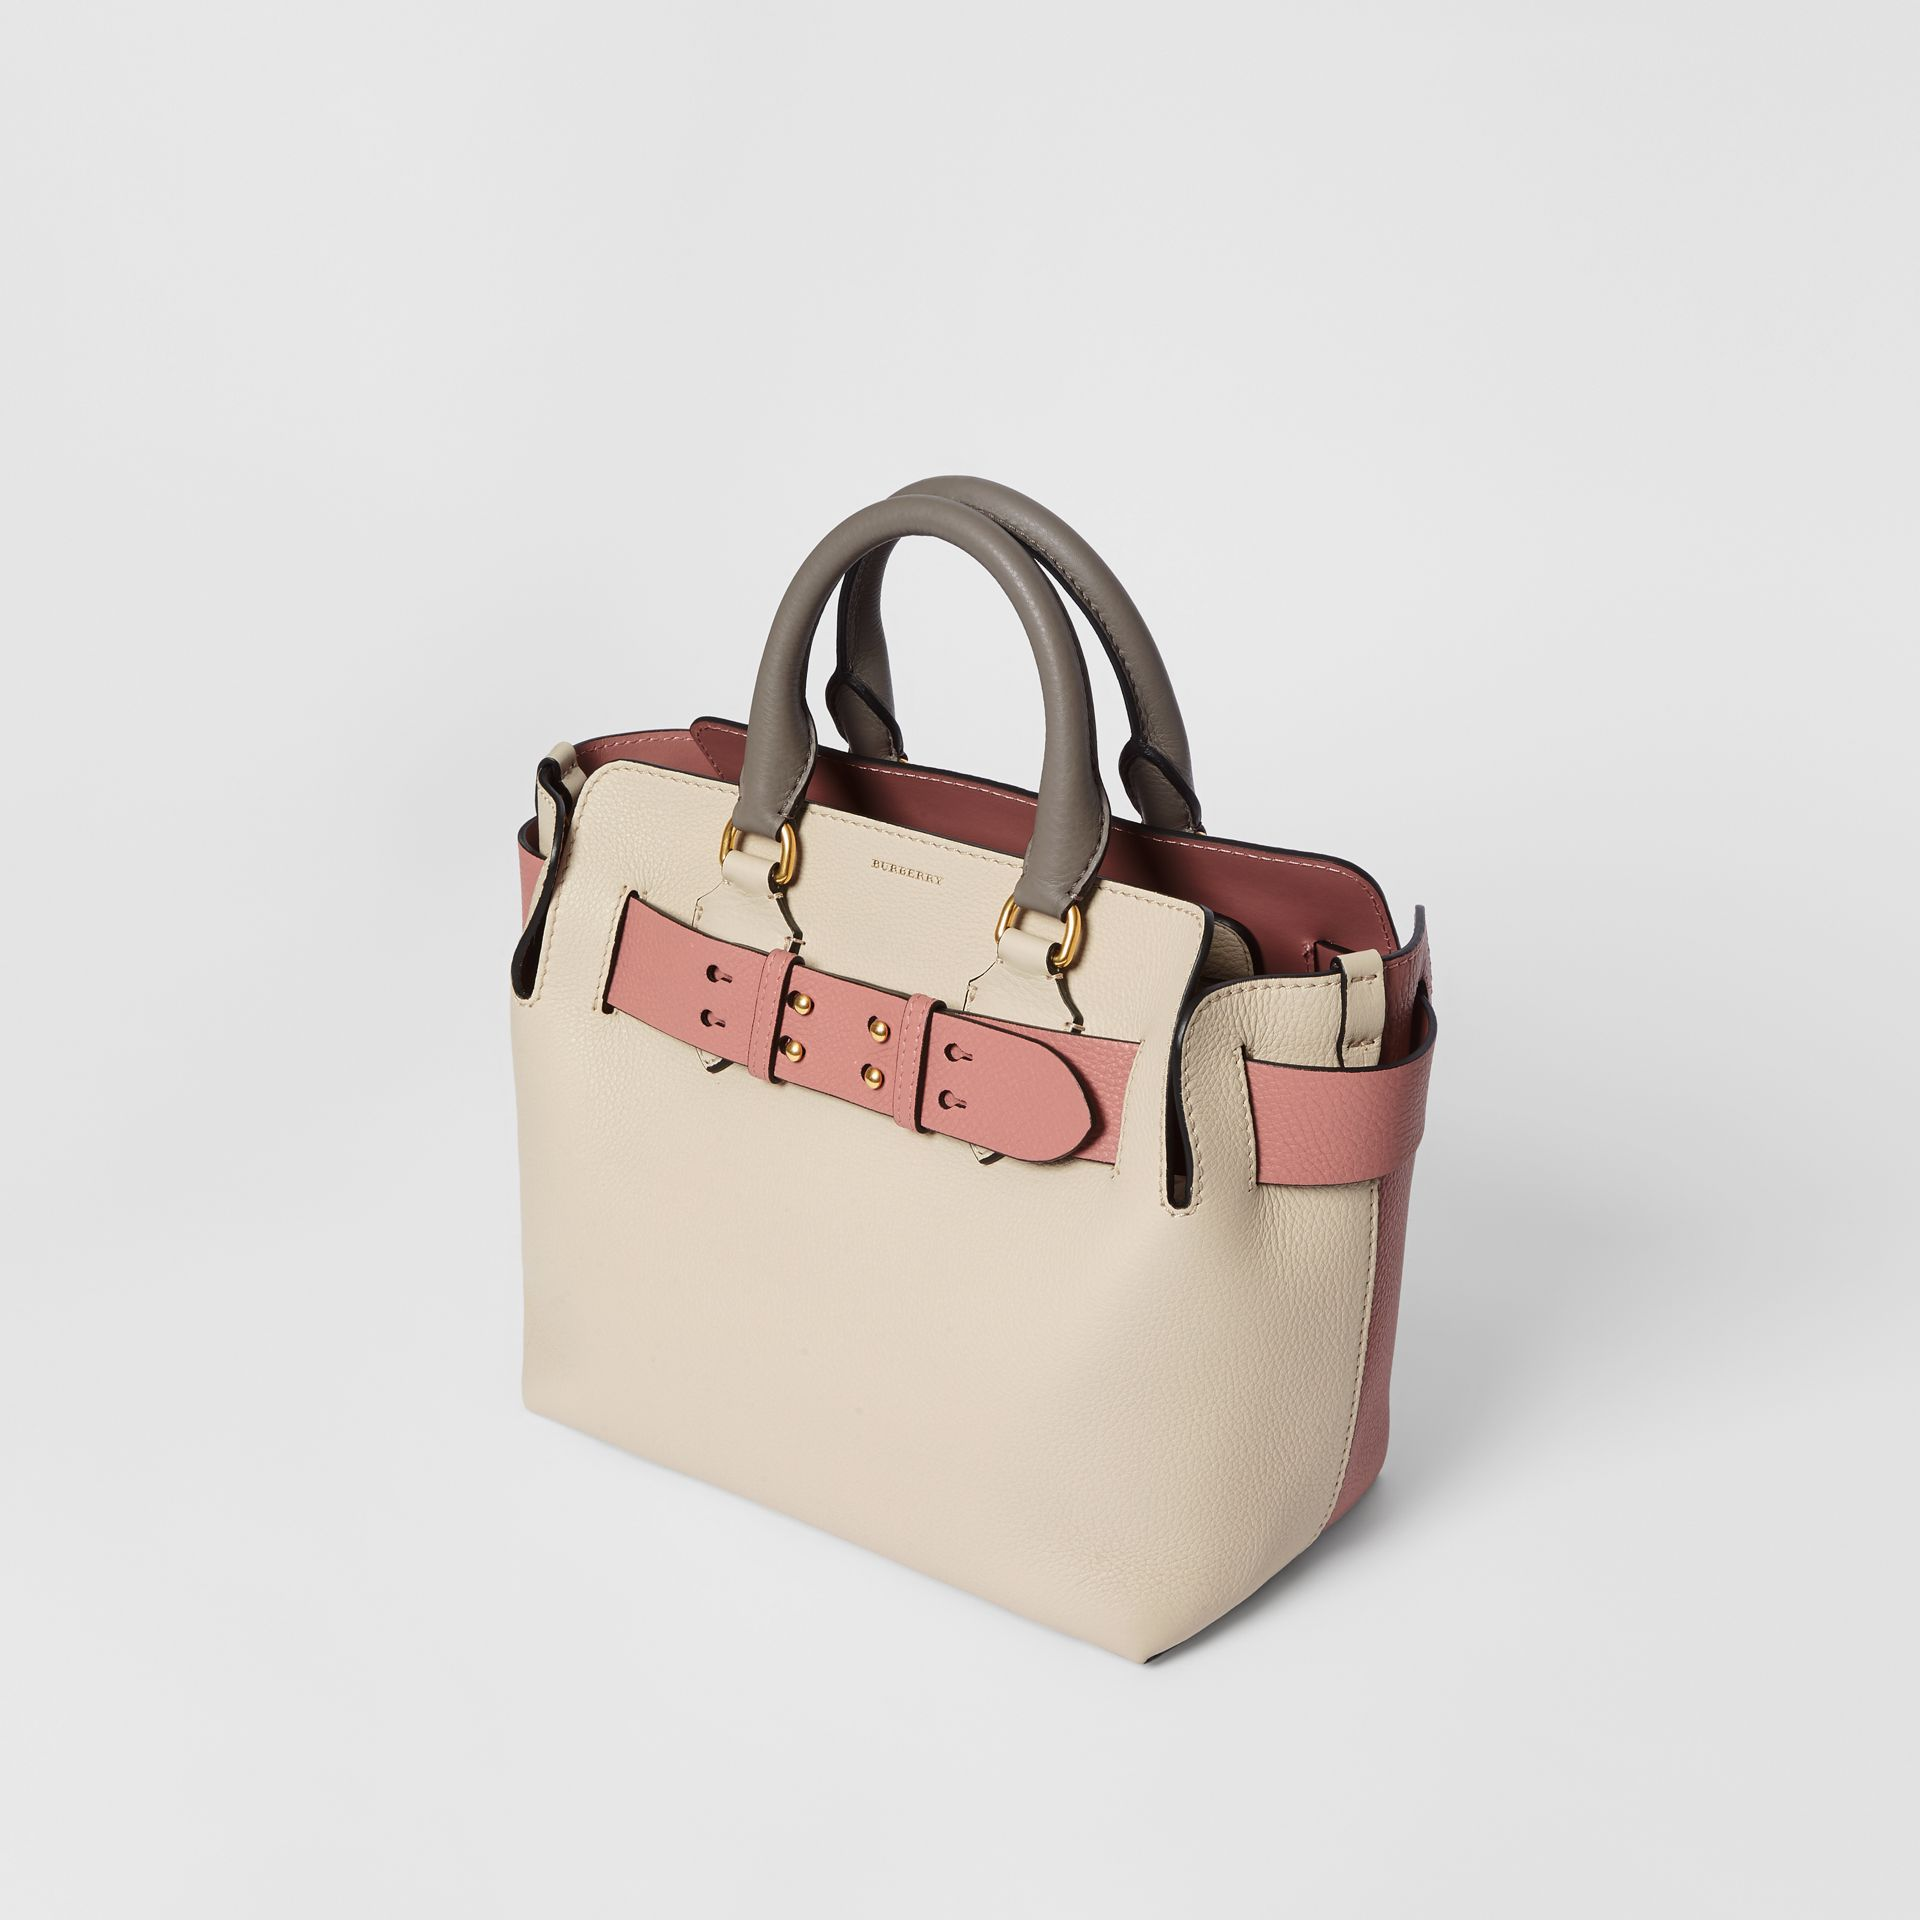 The Small Belt Bag aus Leder in Dreitonoptik (Kalksteinfarben/altrosenfarben) - Damen | Burberry - Galerie-Bild 4